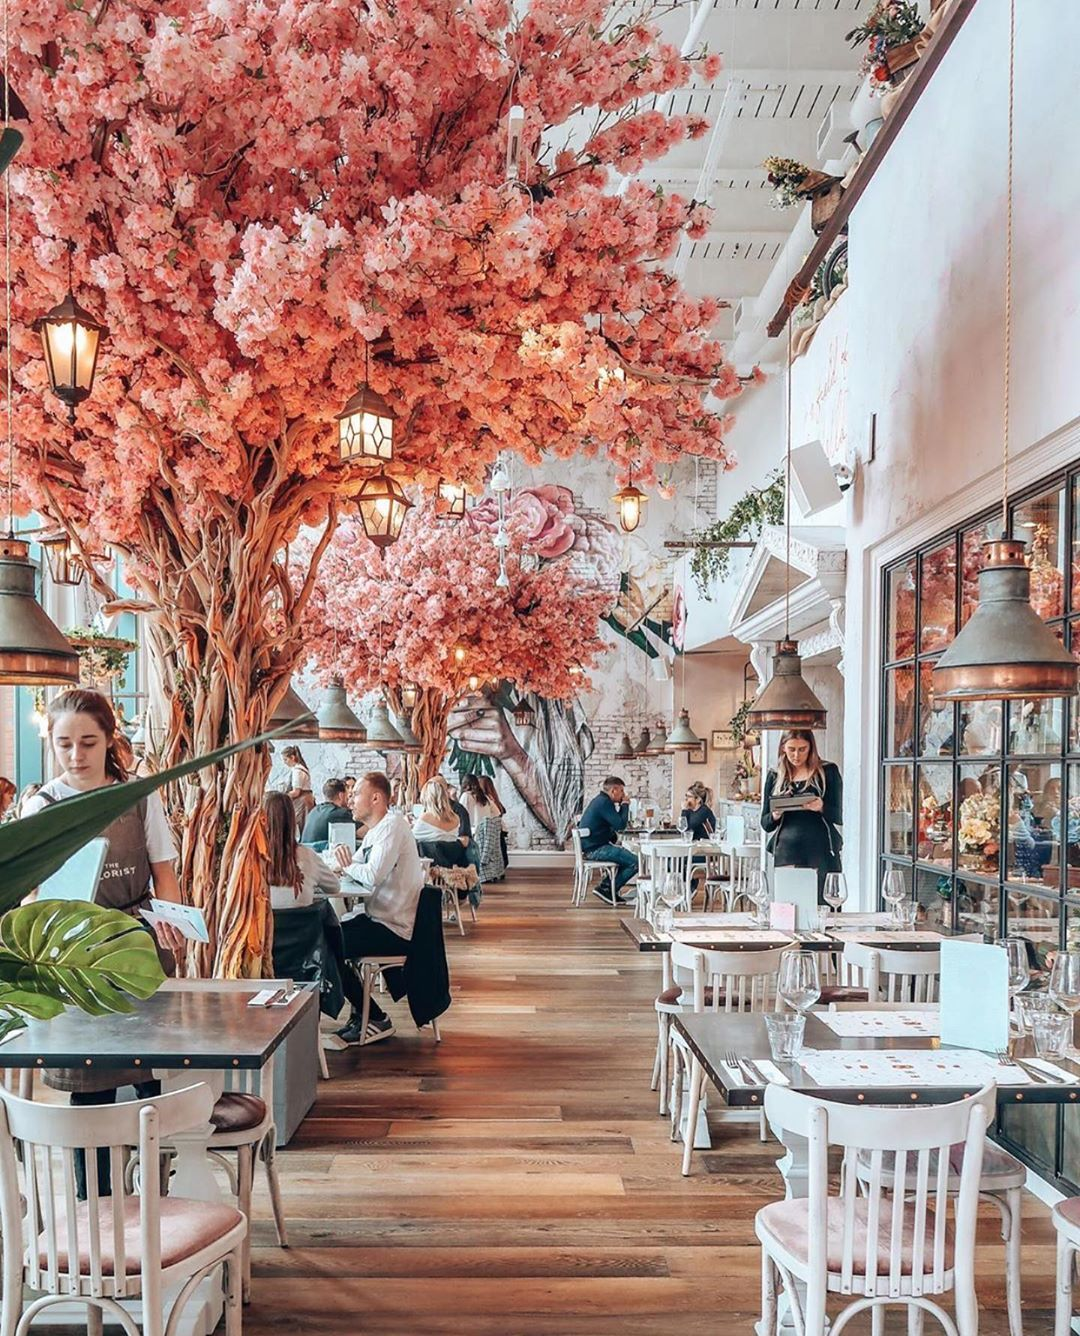 Pretty Little London On Instagram Happy Sunday From This Pretty Spot Photo By Wear Juti Restaurant Decor Bar Design Restaurant Coffee Shops Interior